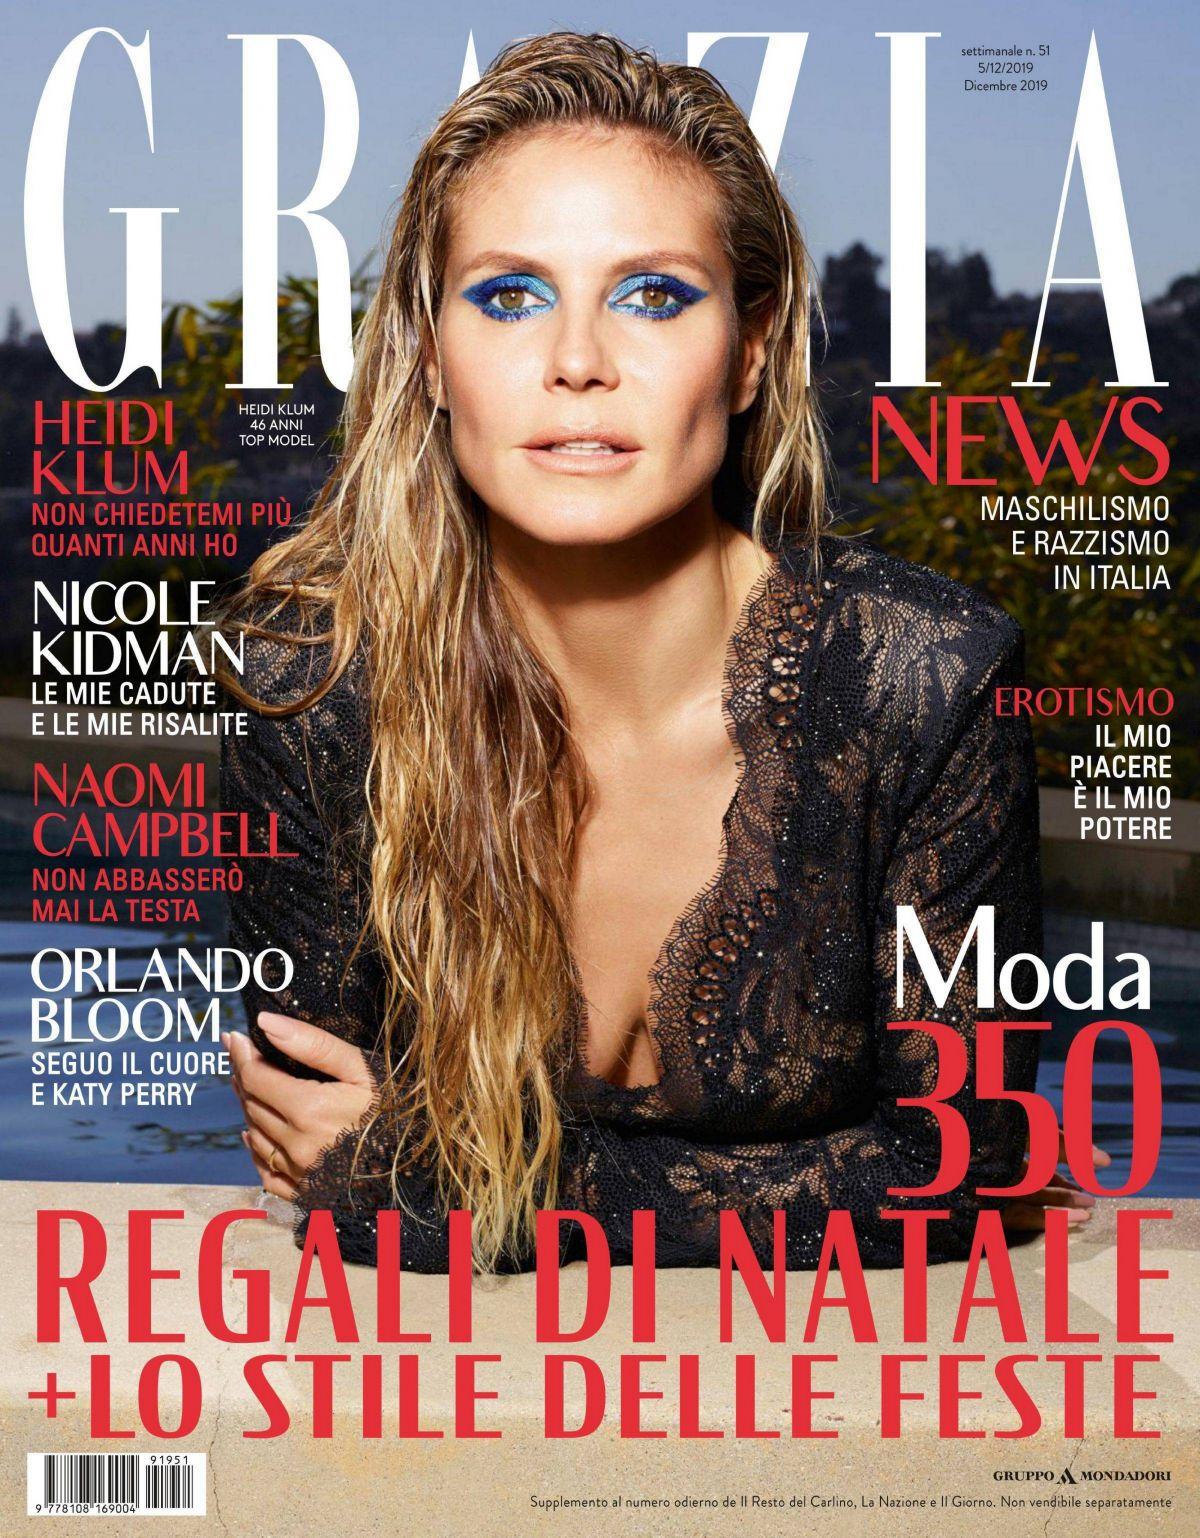 HEIDI KLUM in Grazia Magazine, Italy December 2019